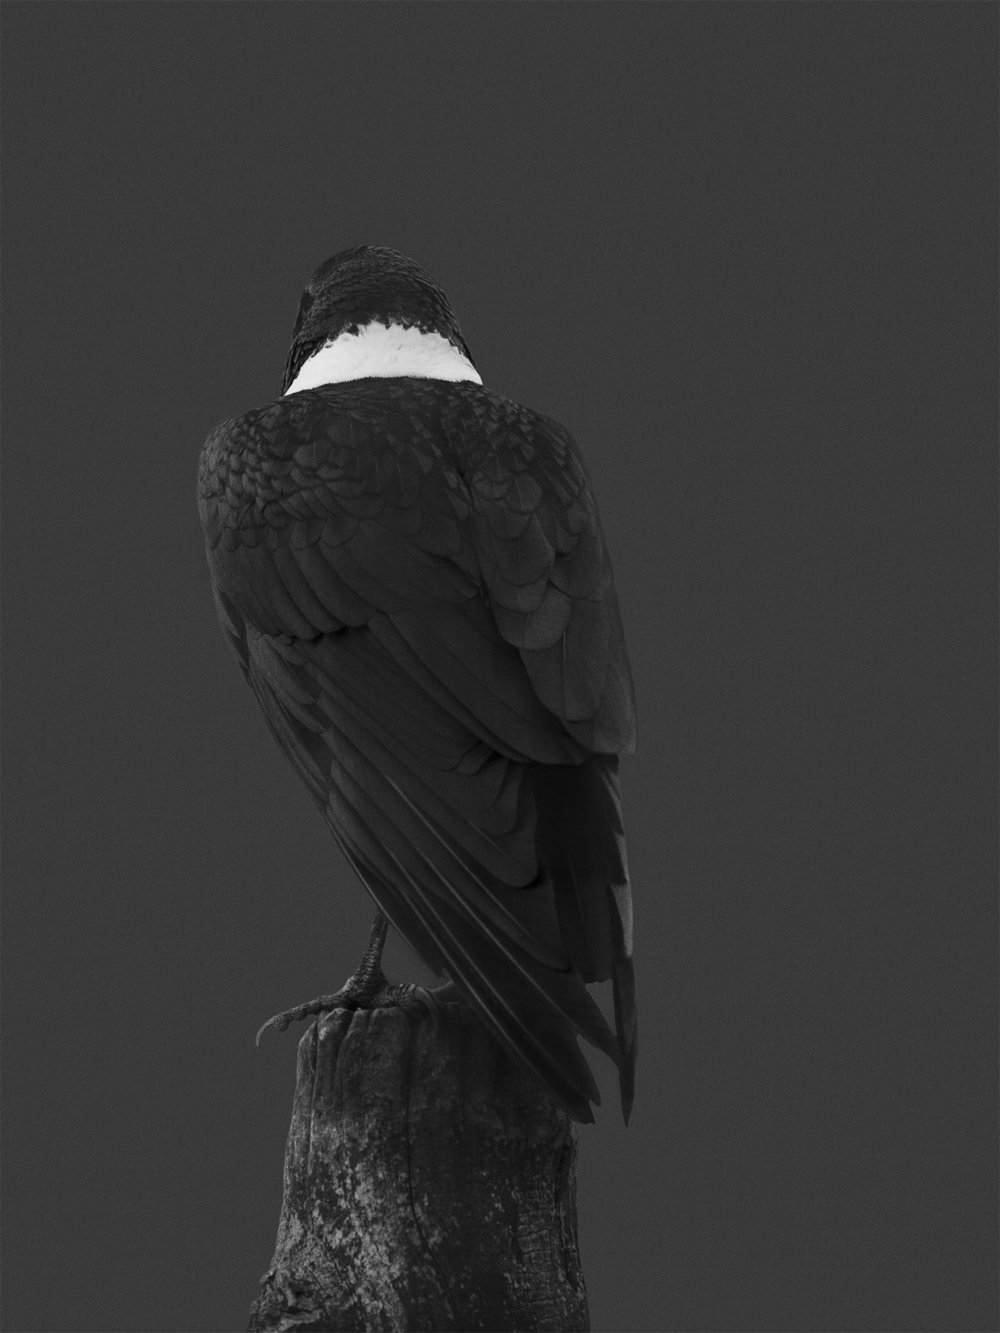 Tier_Mirjana Vrbaski_Crow